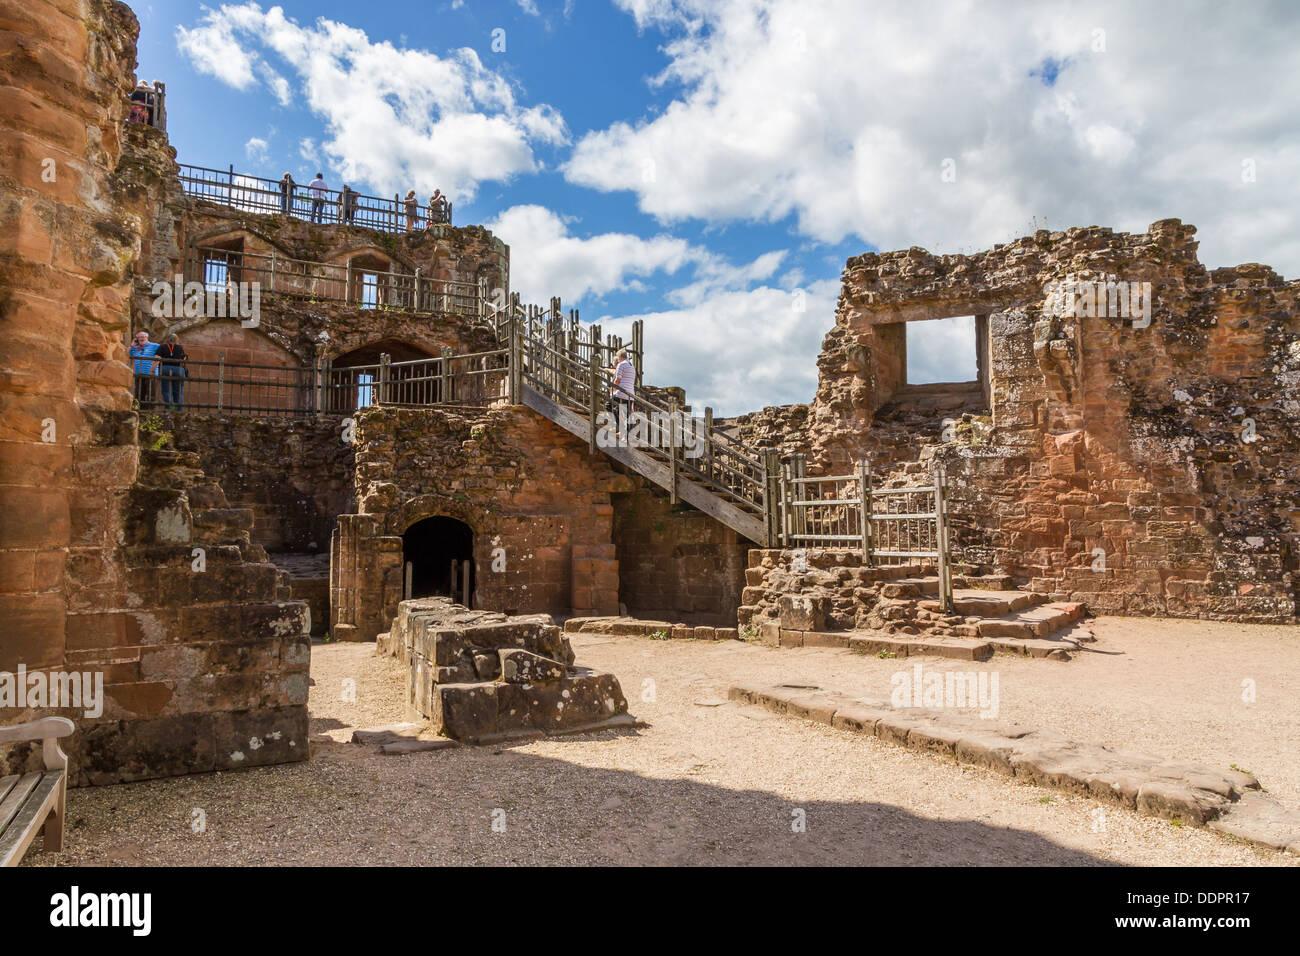 The Ruins of Kenilworth Castle, Kenilworth, Warwickshire. - Stock Image